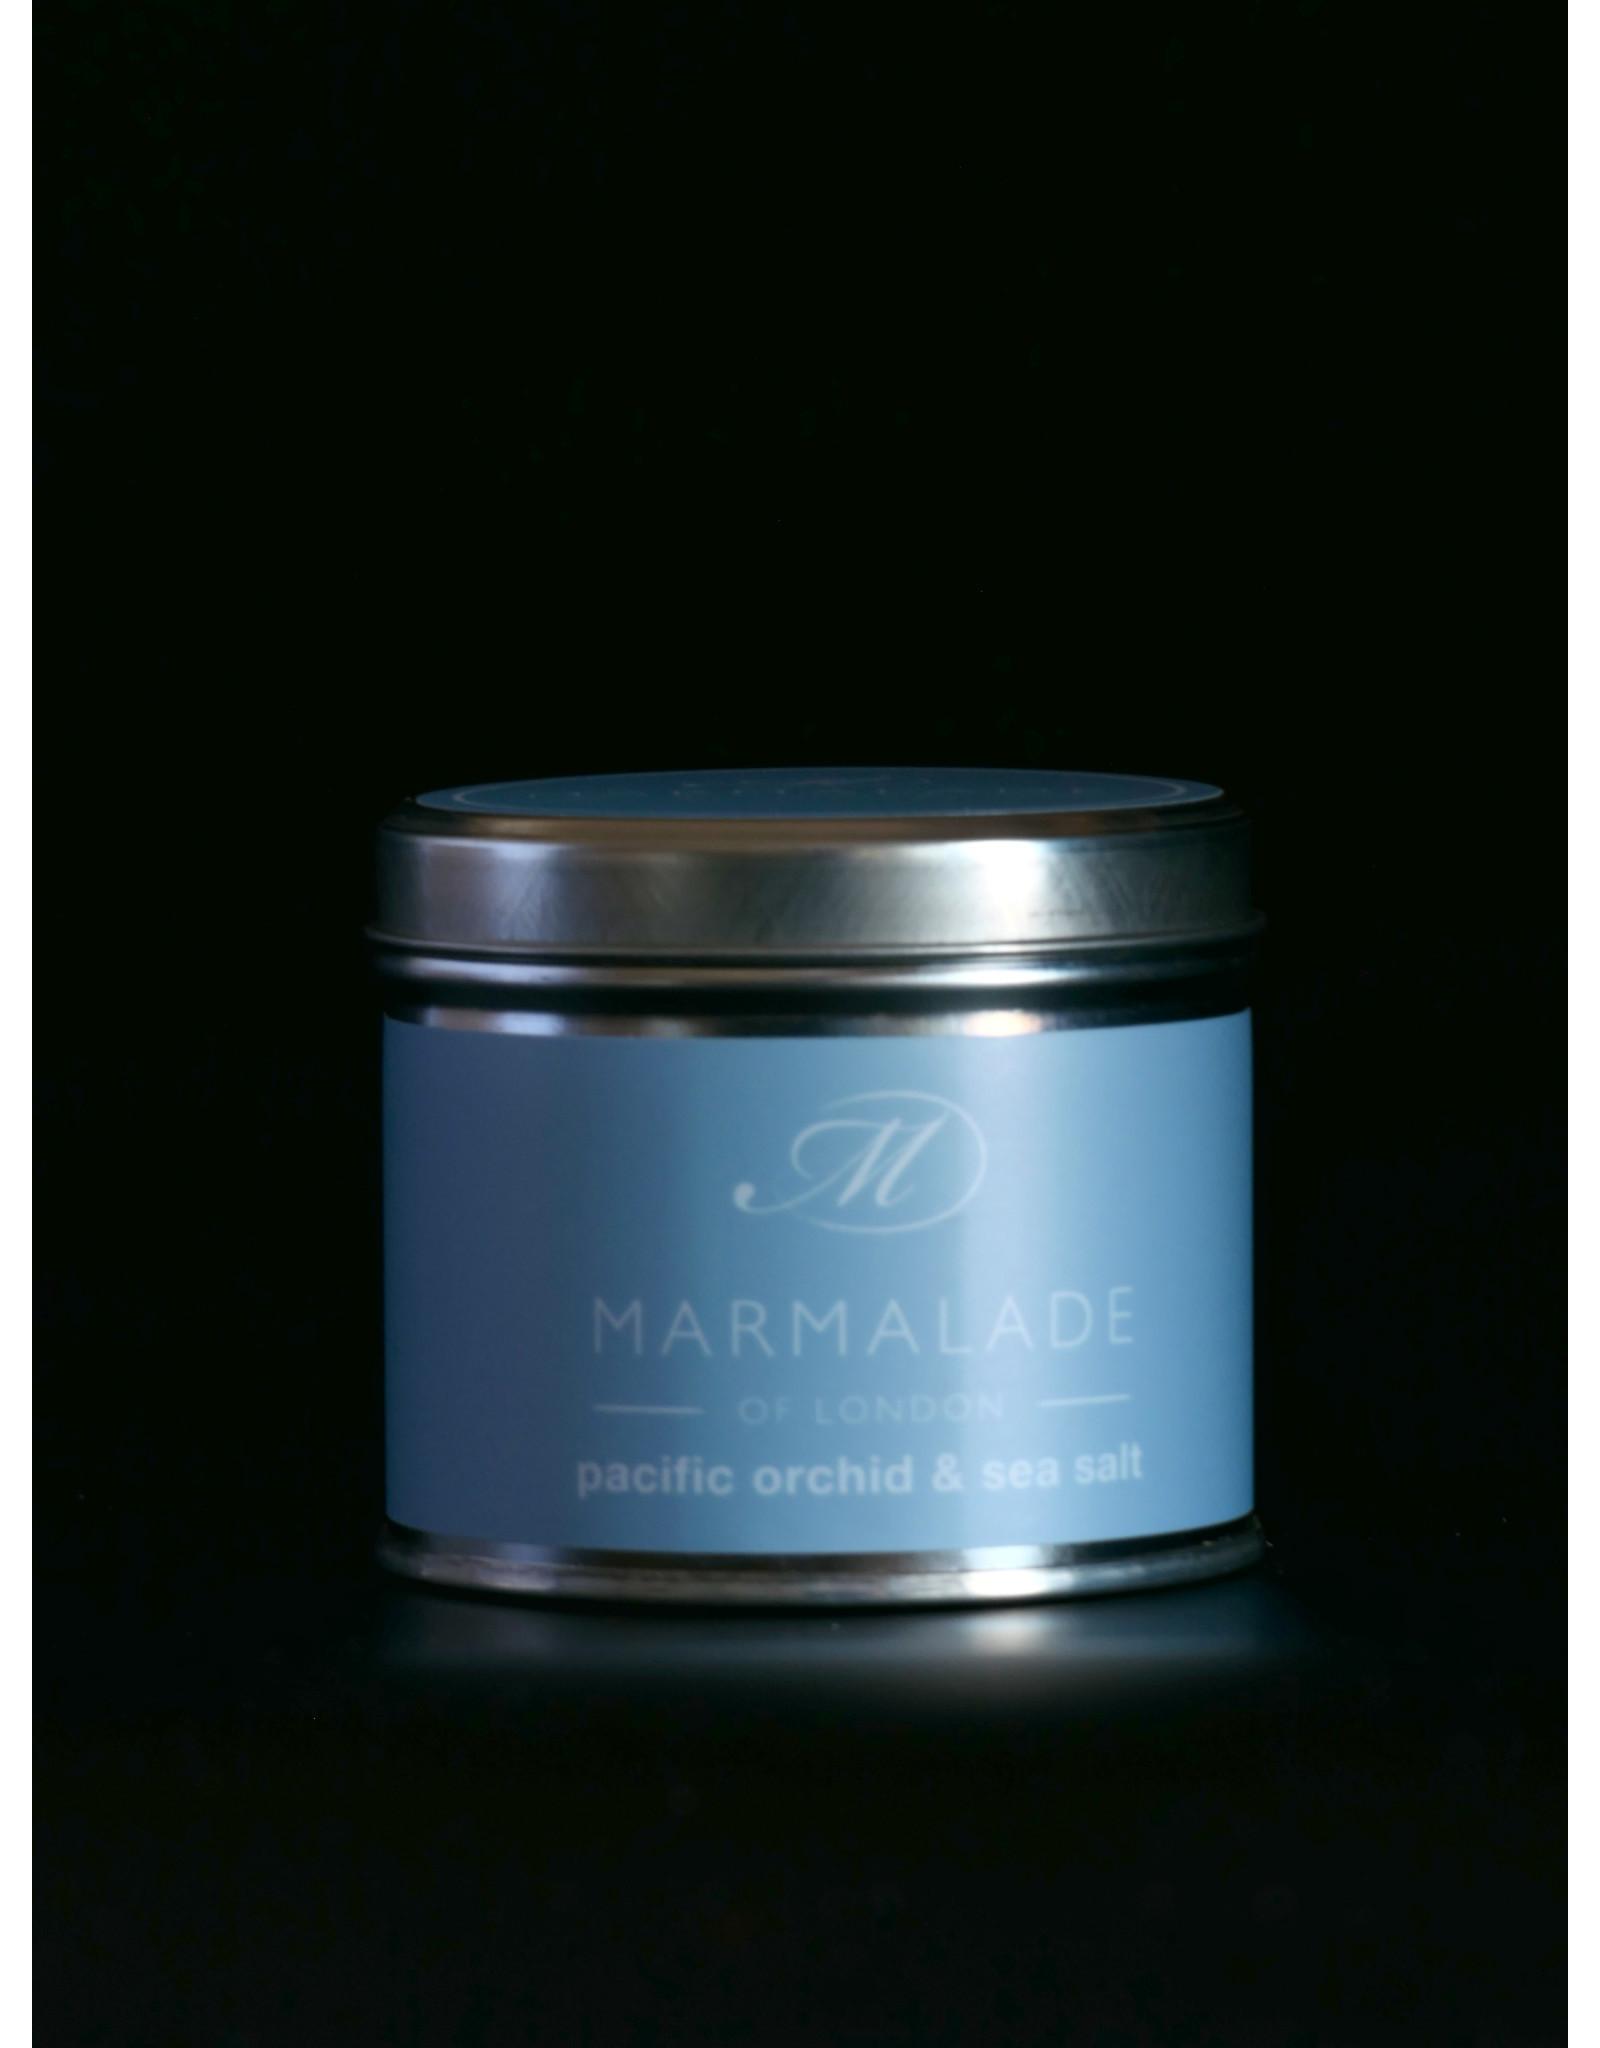 MARMALADE MARMALADE SOY WAX CANDLE PACIFIC ORCHID & SEA SALT